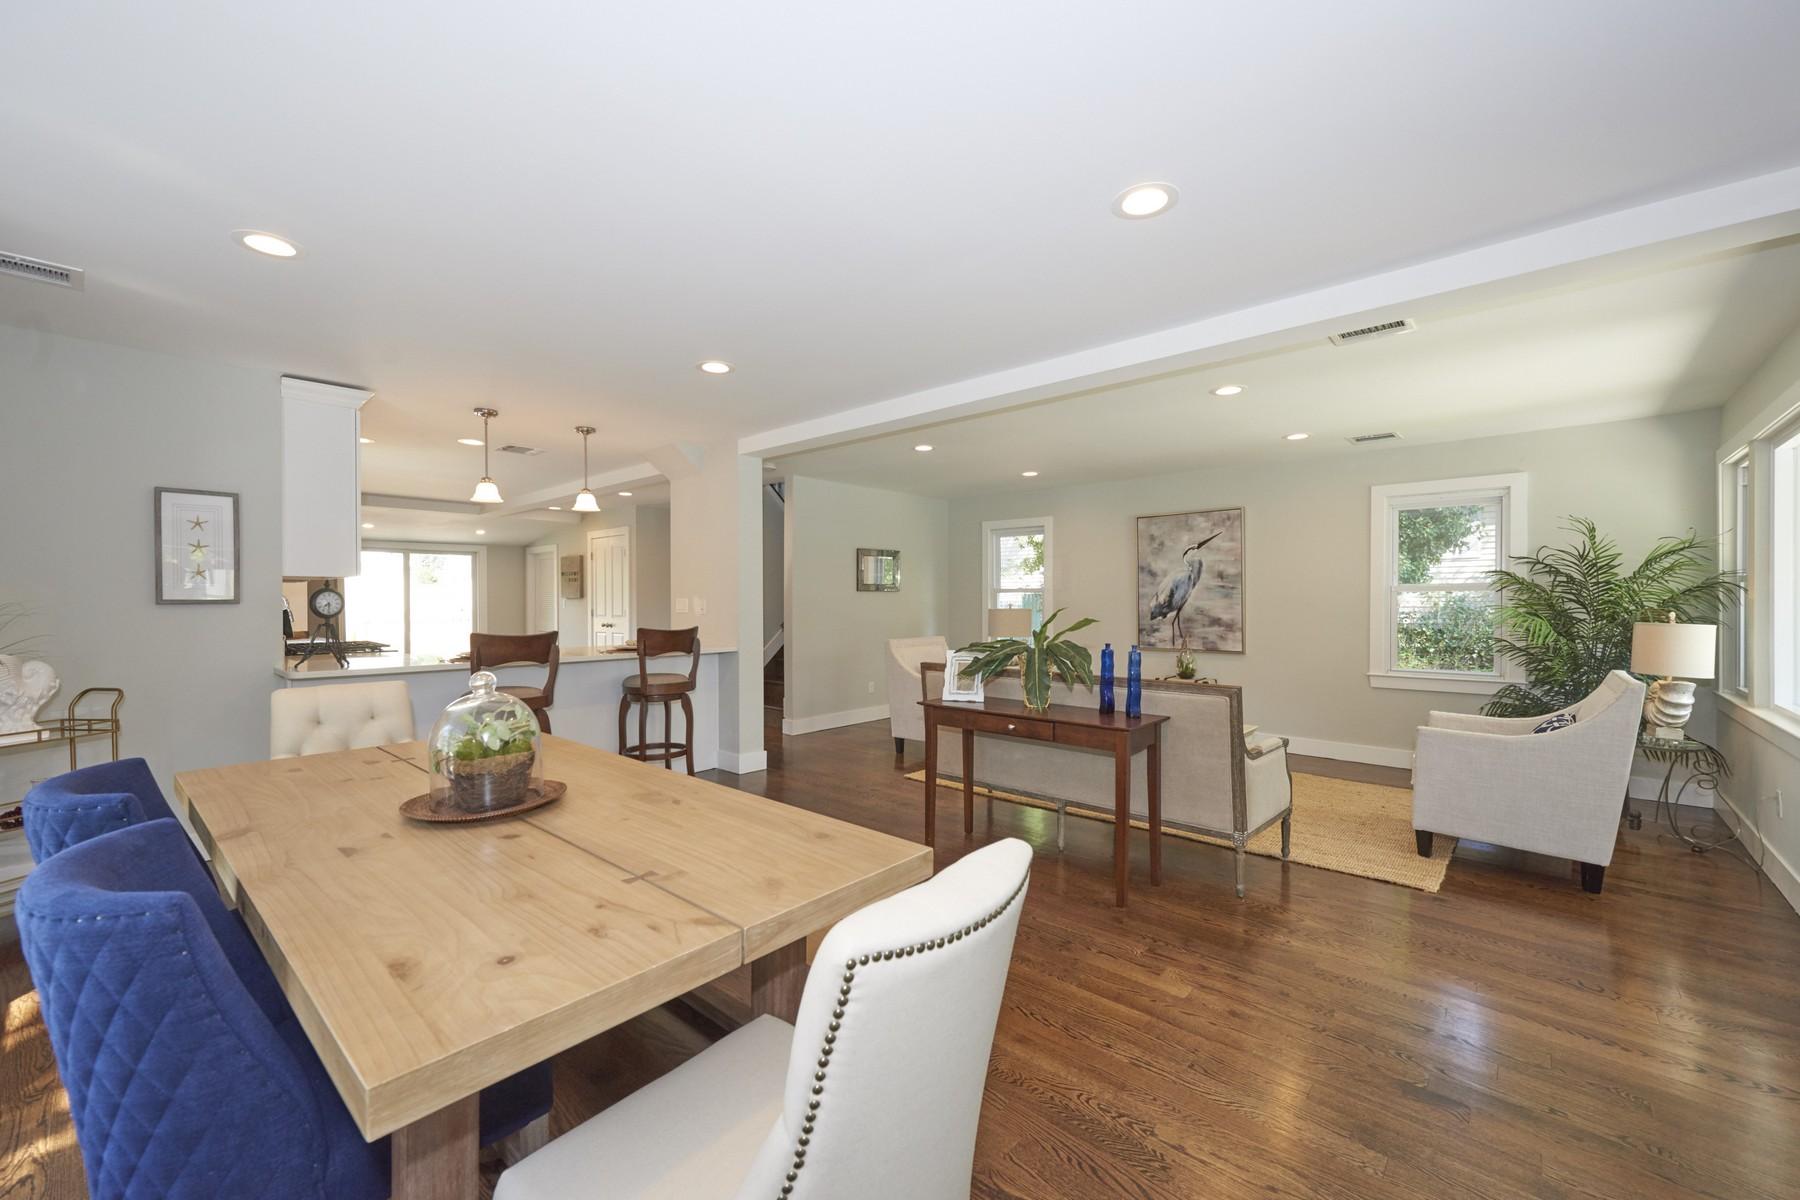 Single Family Homes för Försäljning vid Not Just A Renovated Home But A Lifestyle 121 Mabel Ave., Middletown, New Jersey 07748 Förenta staterna